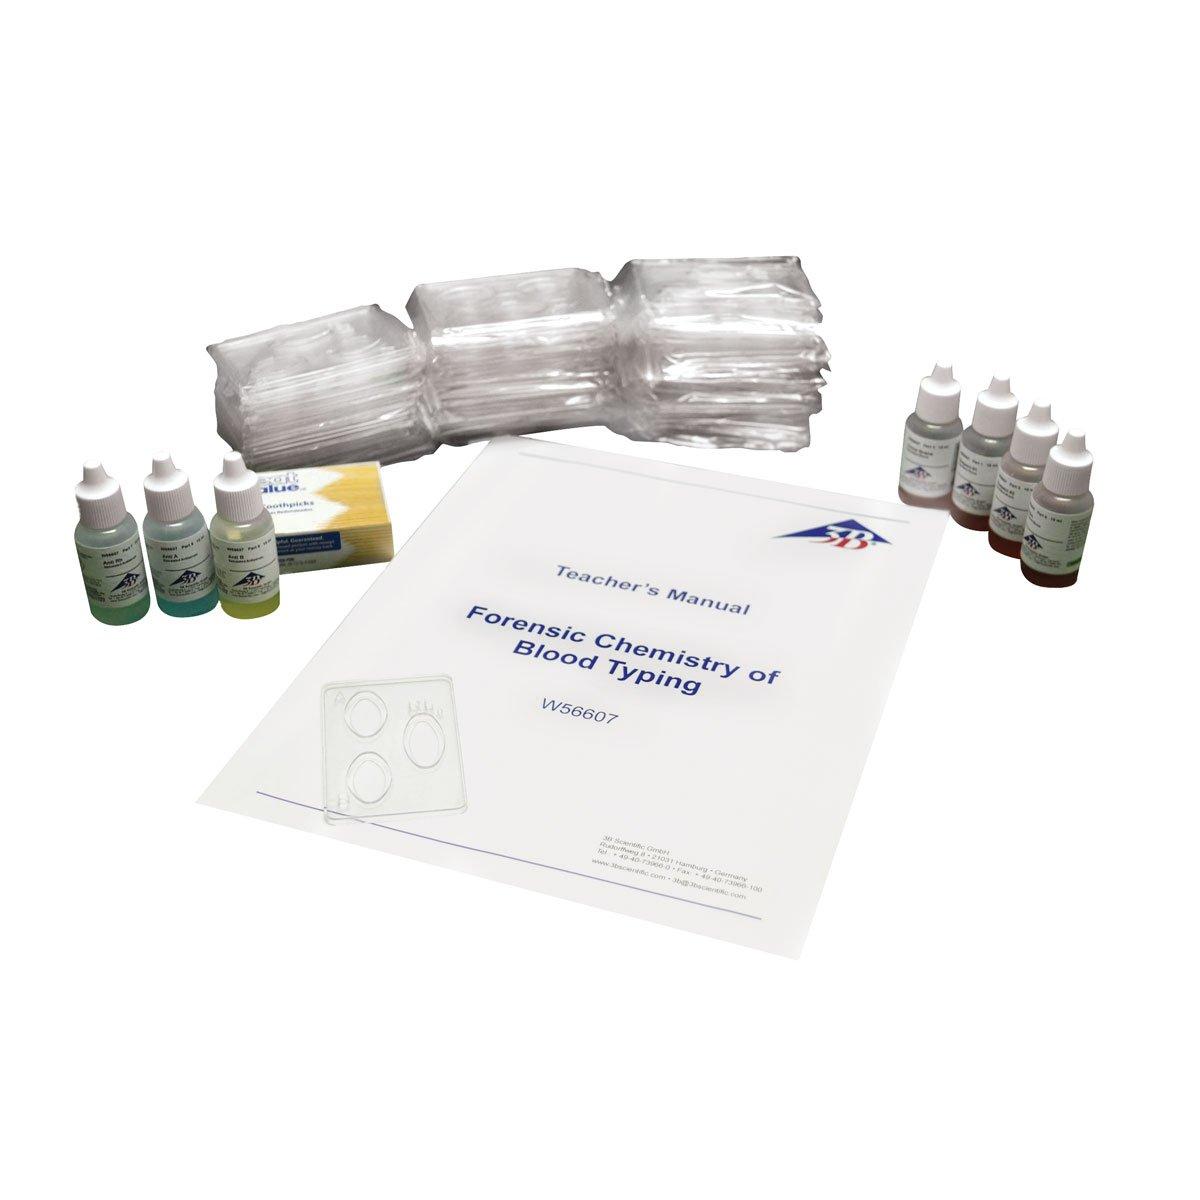 3B Scientific W56607 Forensic Chemistry of Blood Types Kit